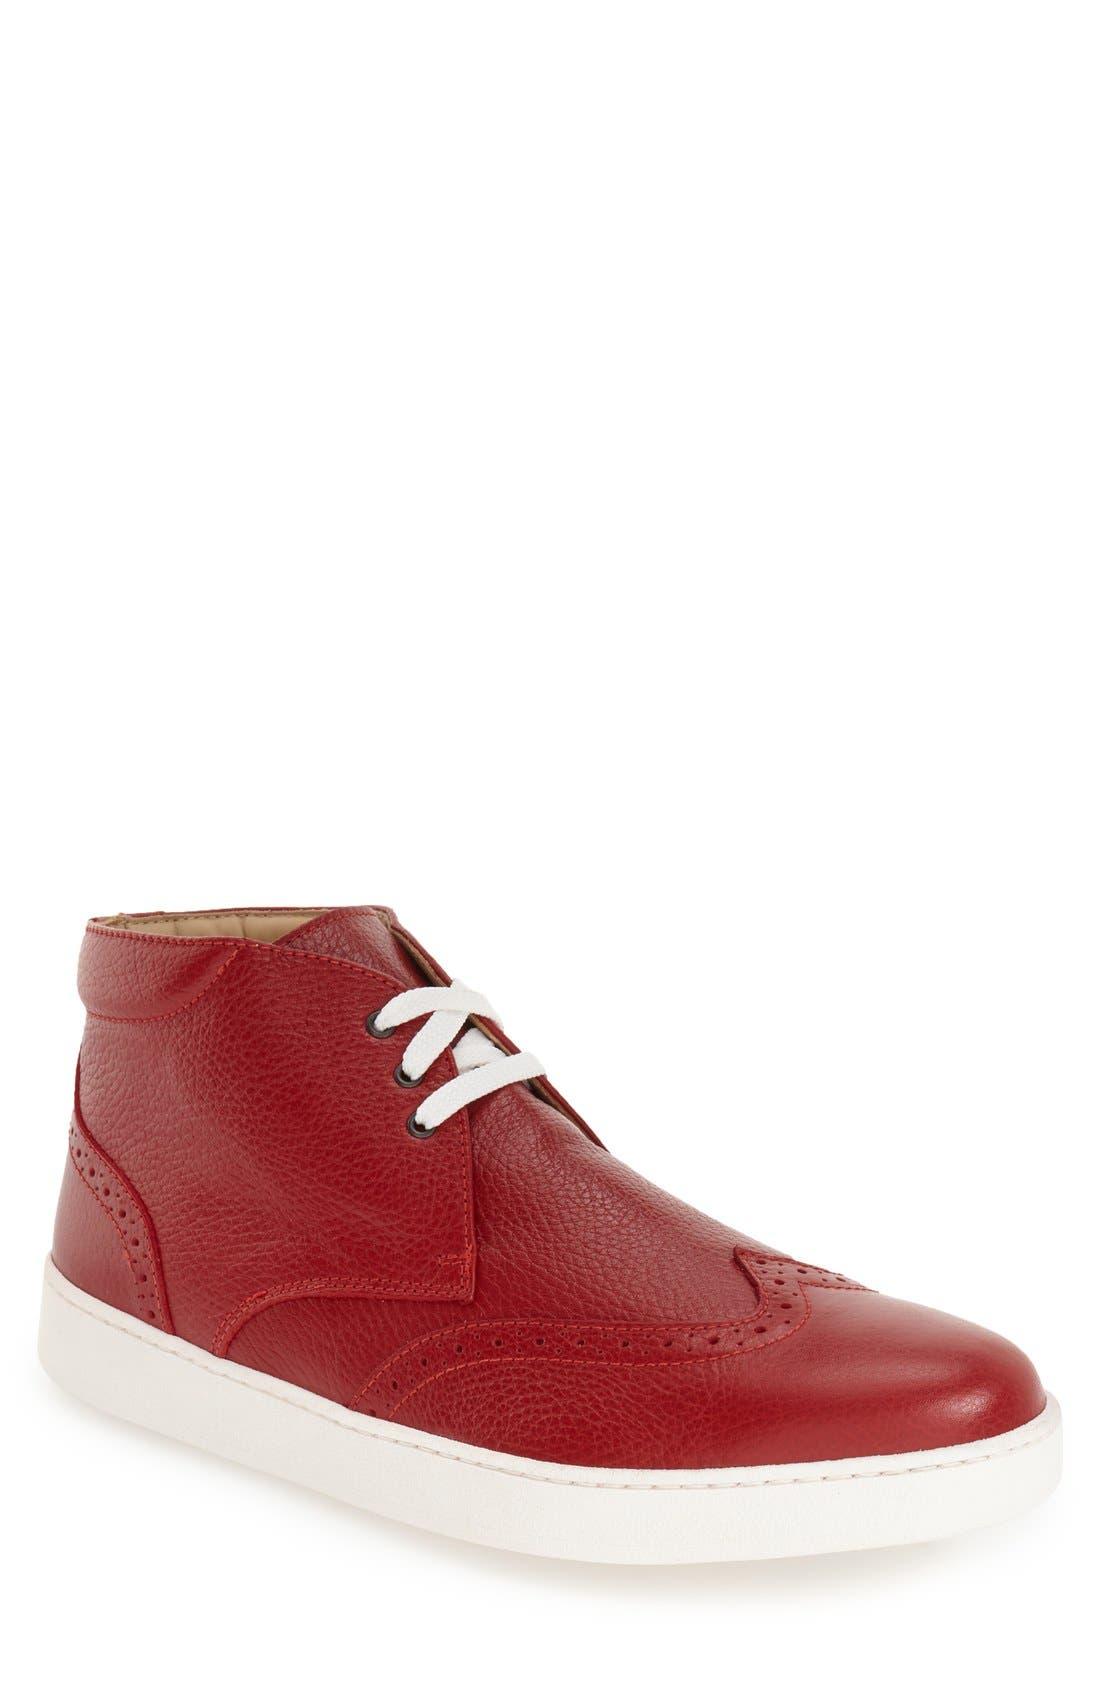 BUGATCHI 'Portofino' High Top Sneaker